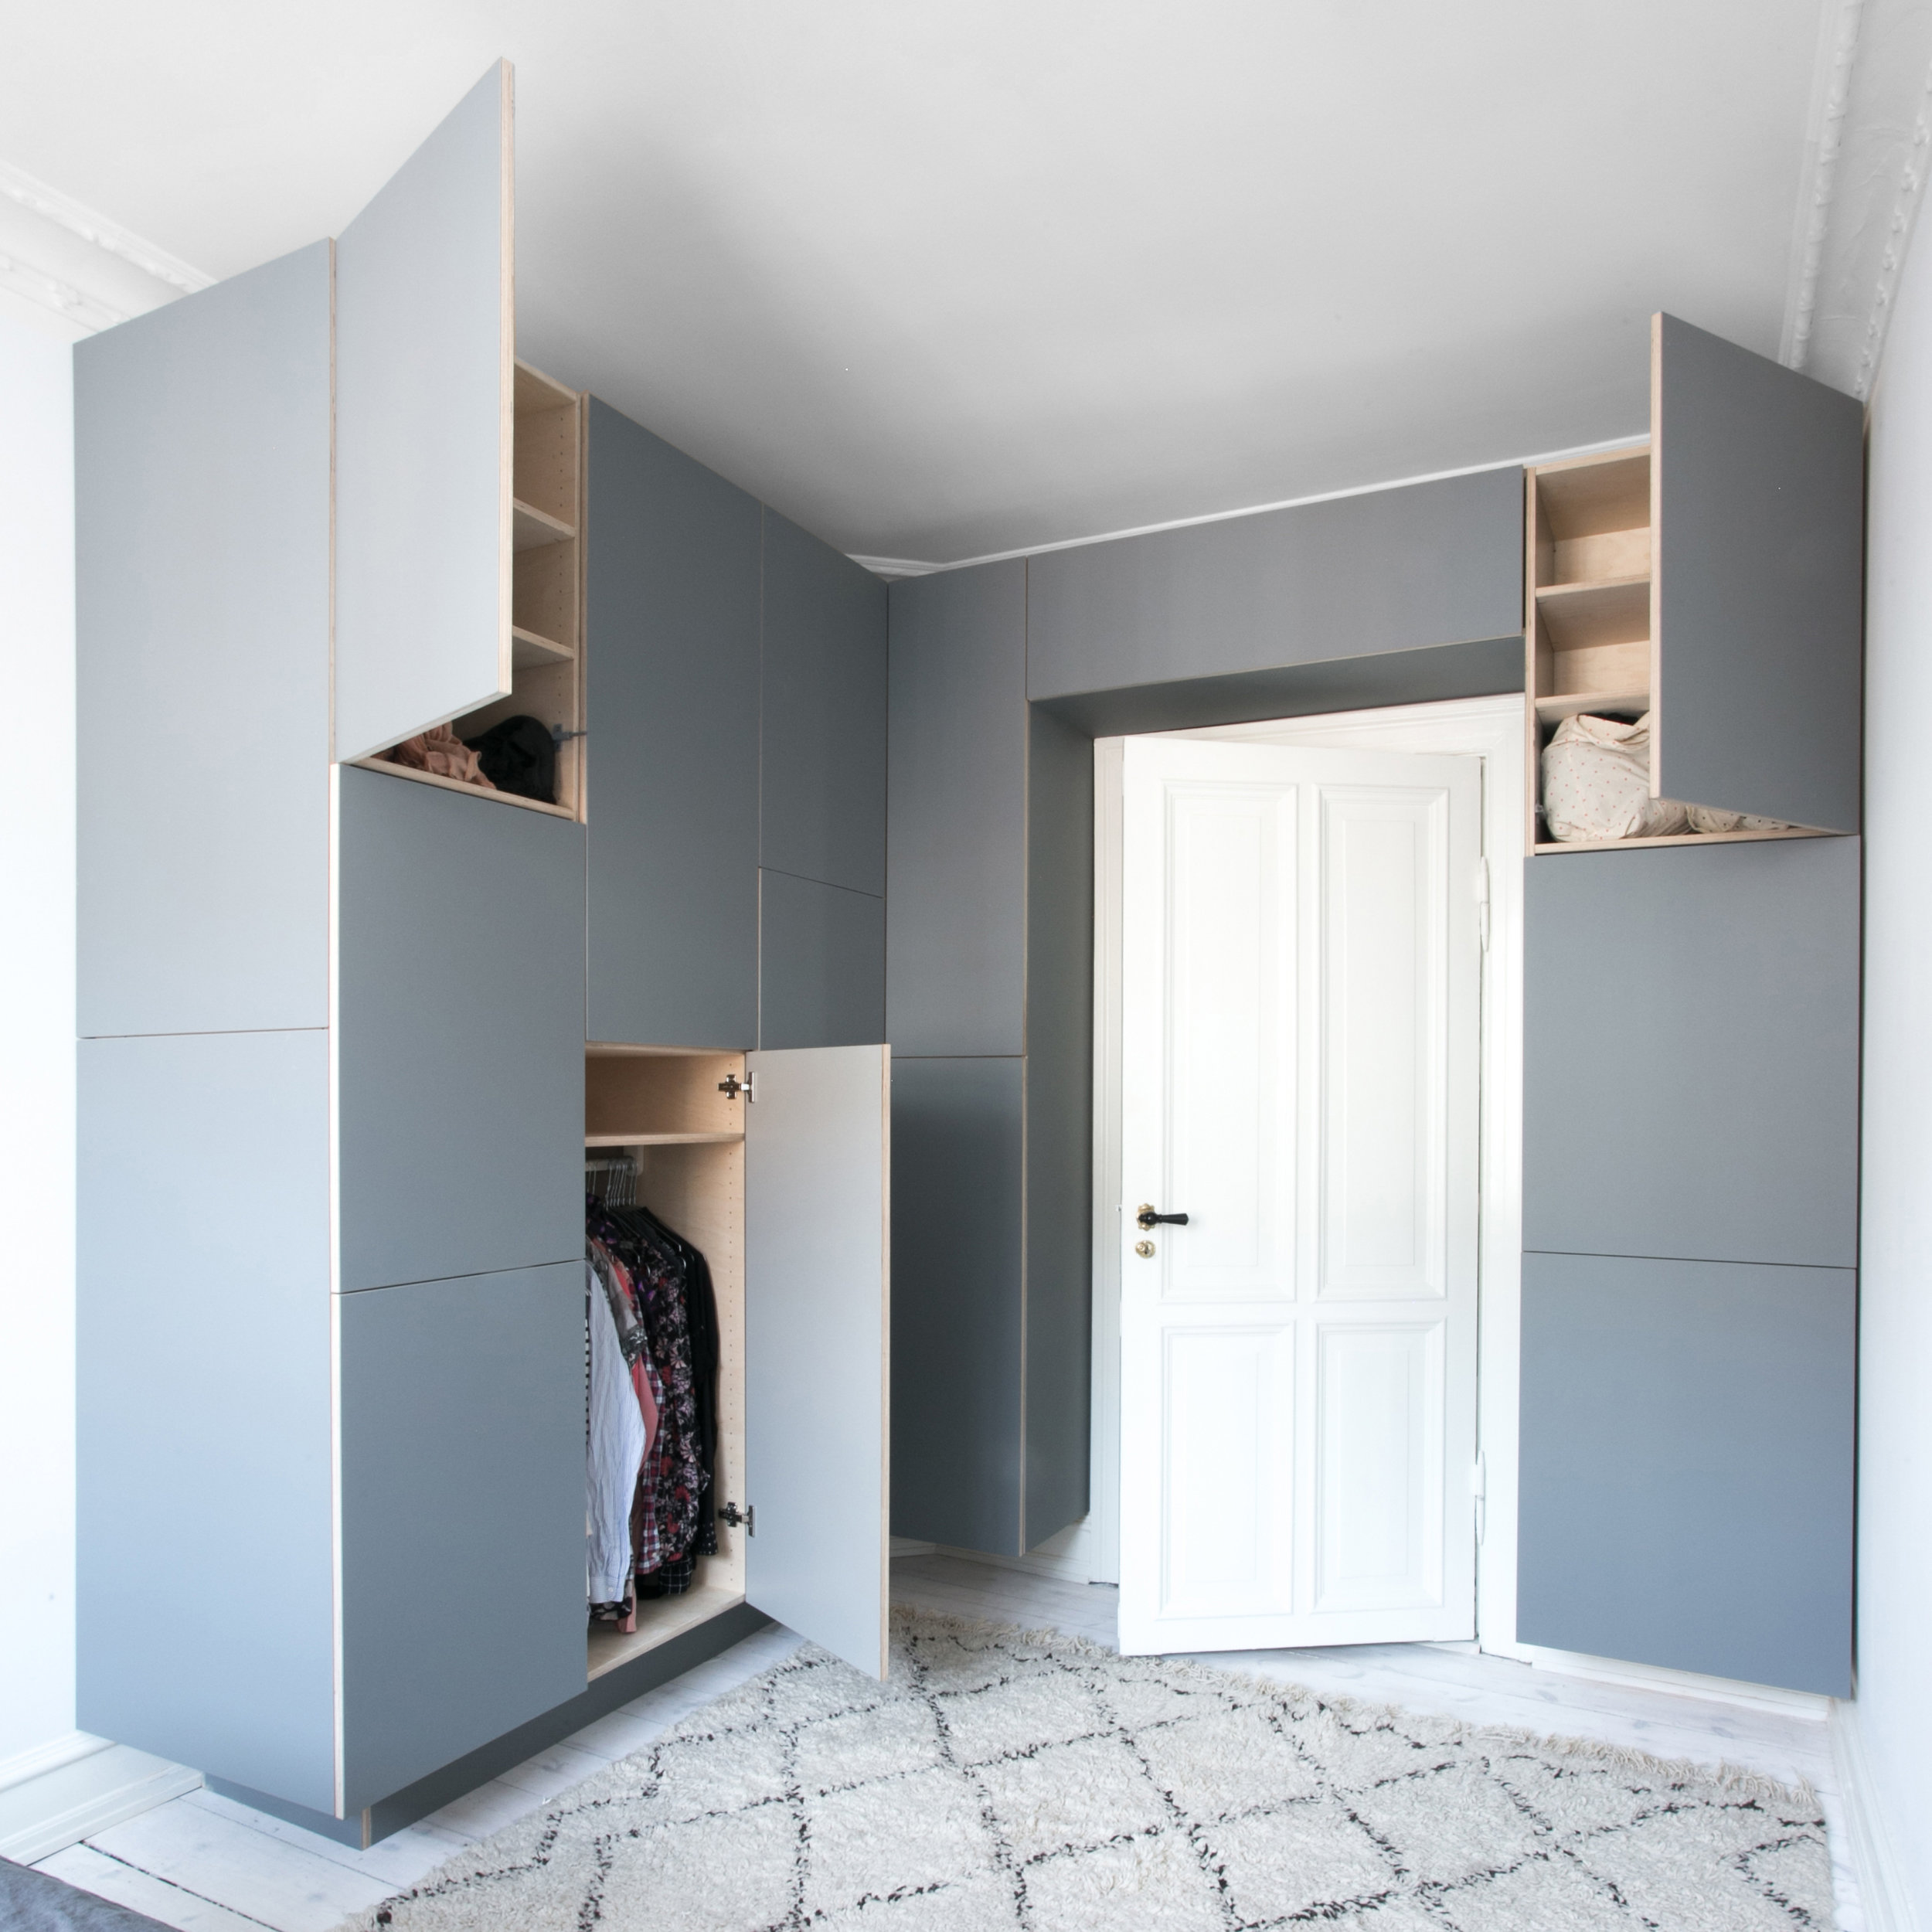 Indbygget garderobe